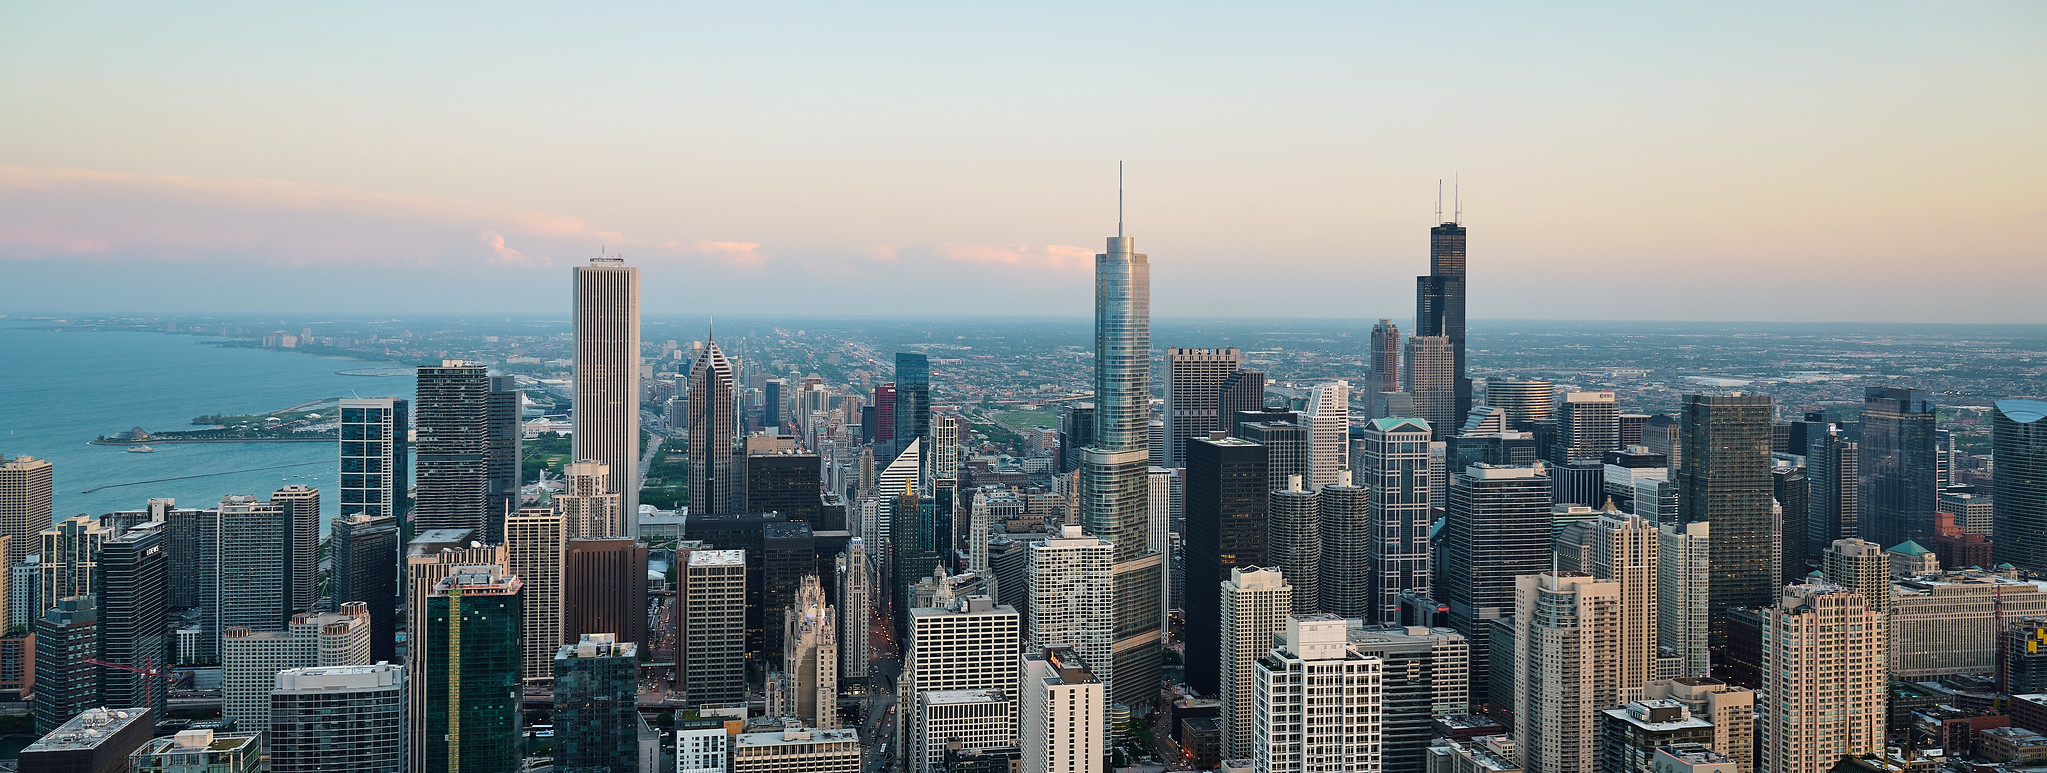 Access Database Consultants Chicago, Illinois